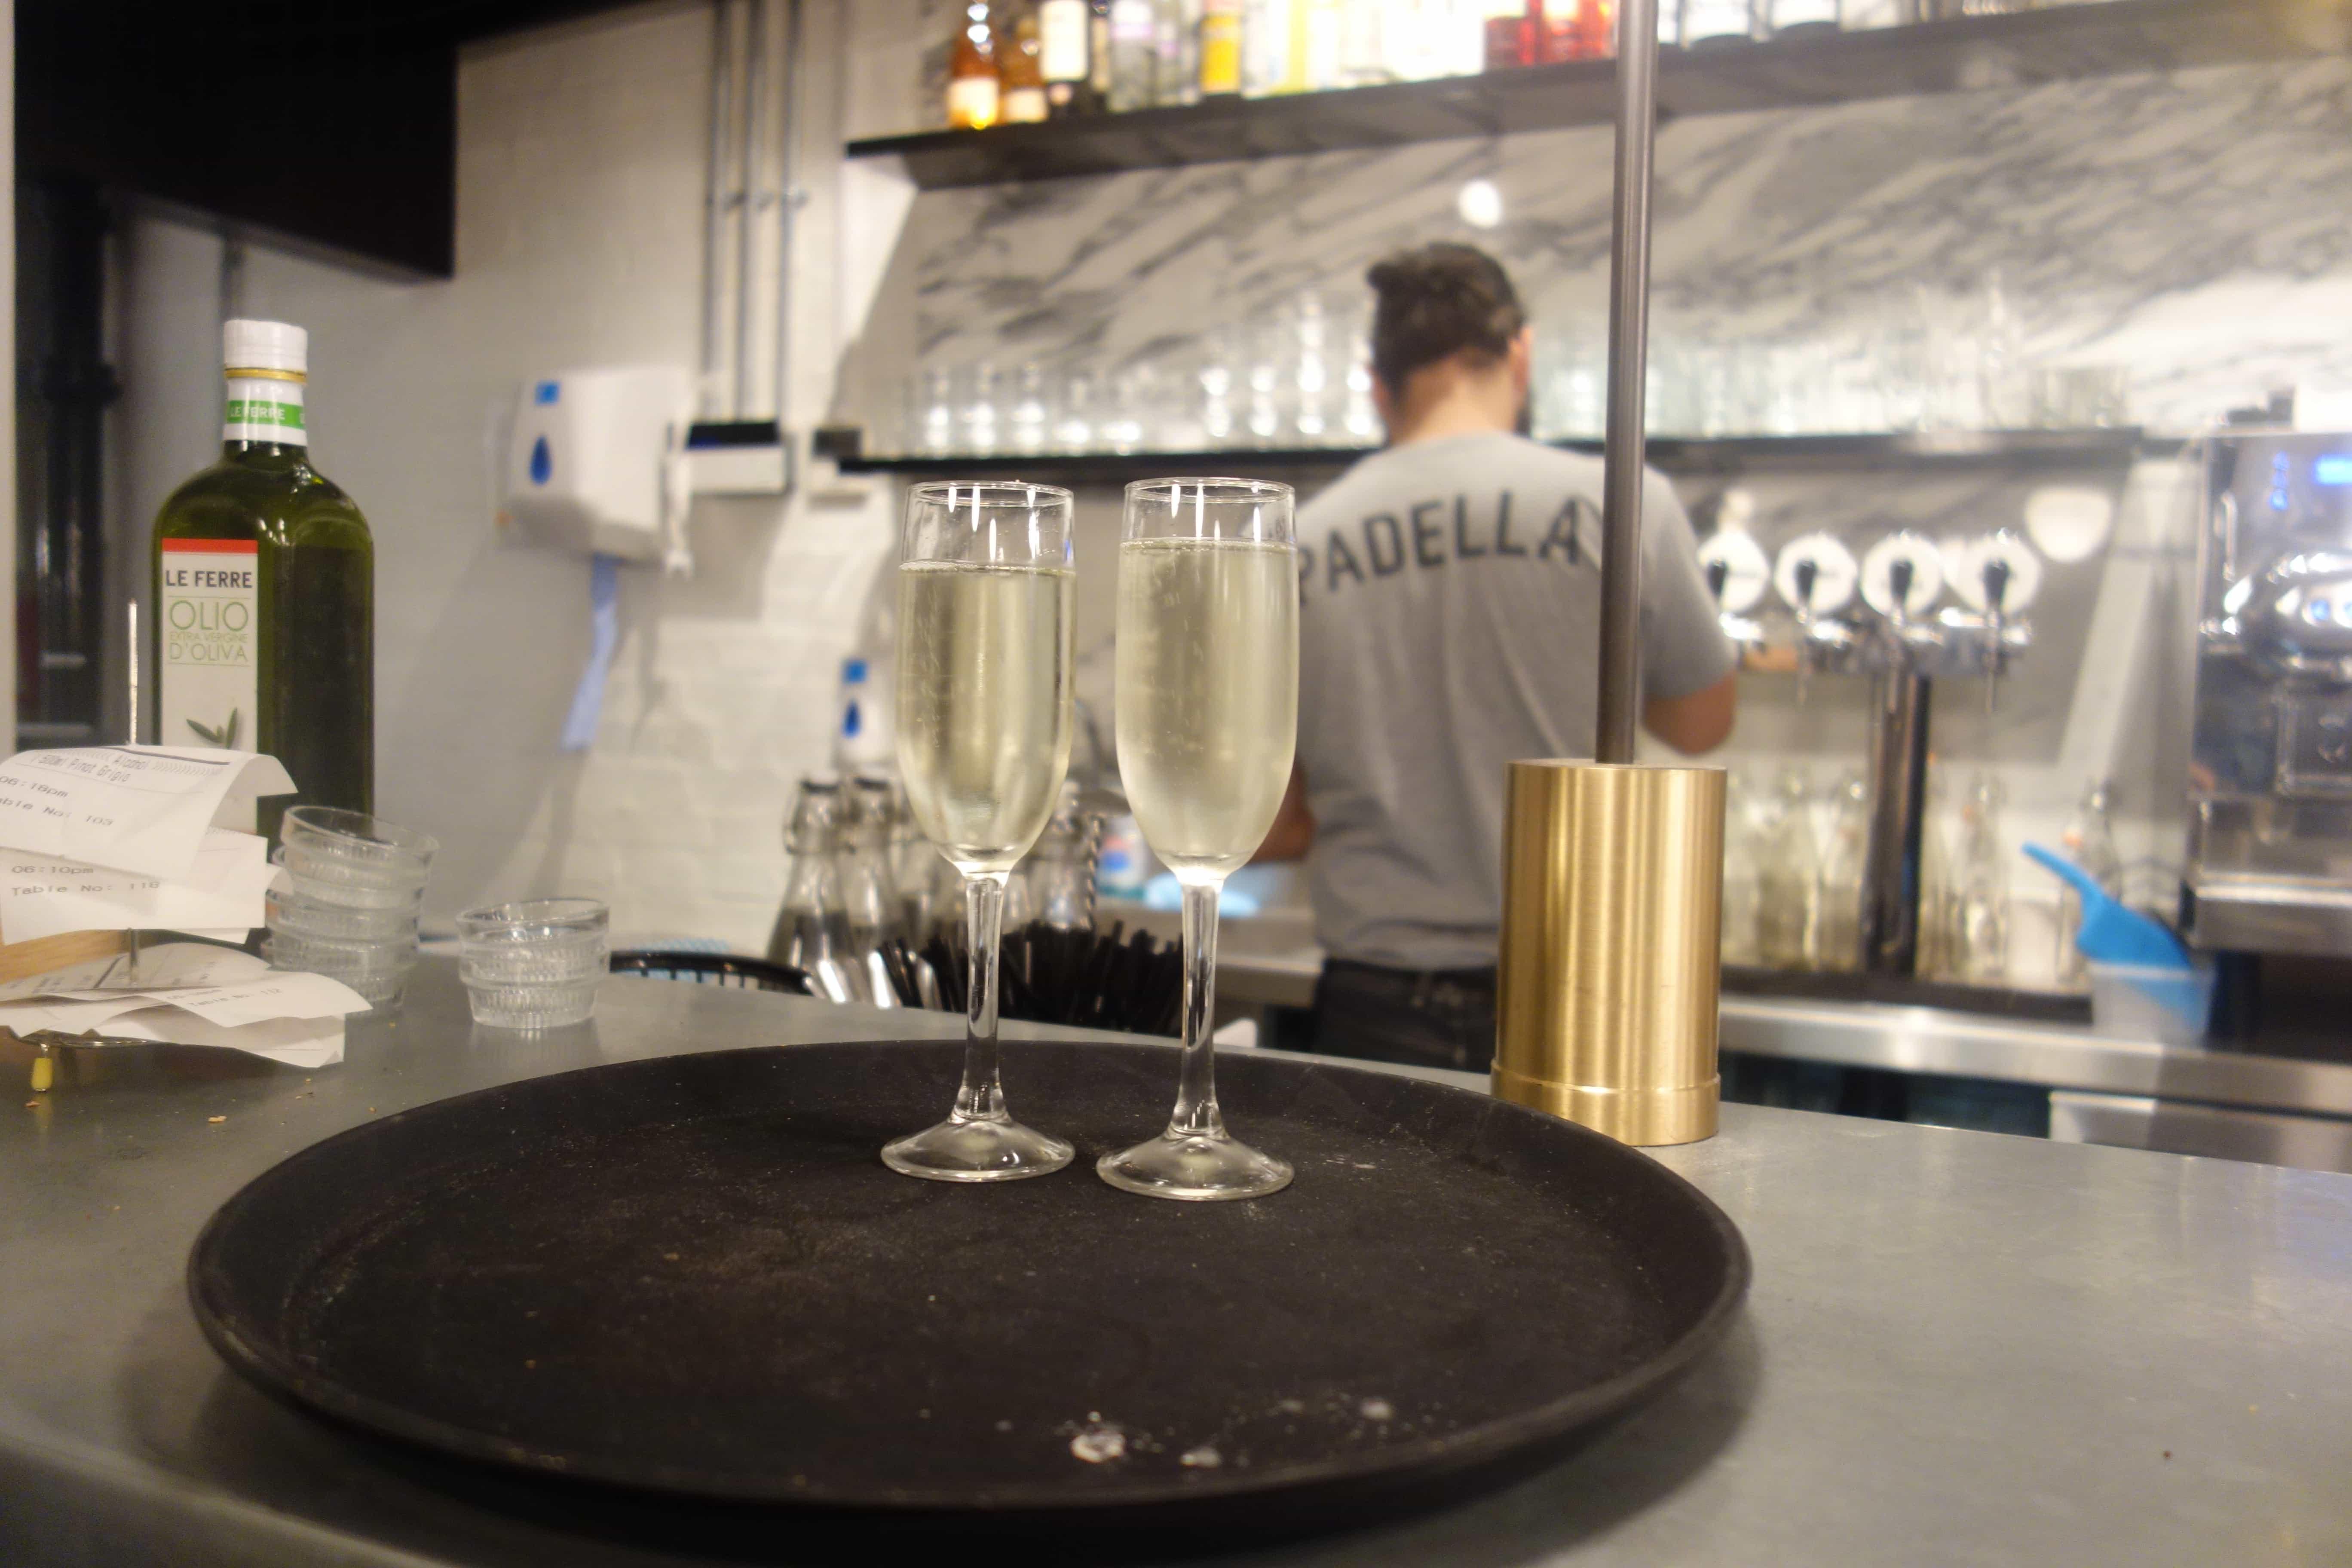 Padella Pasta, Borough Market - Londons Best Date Night Restaurants